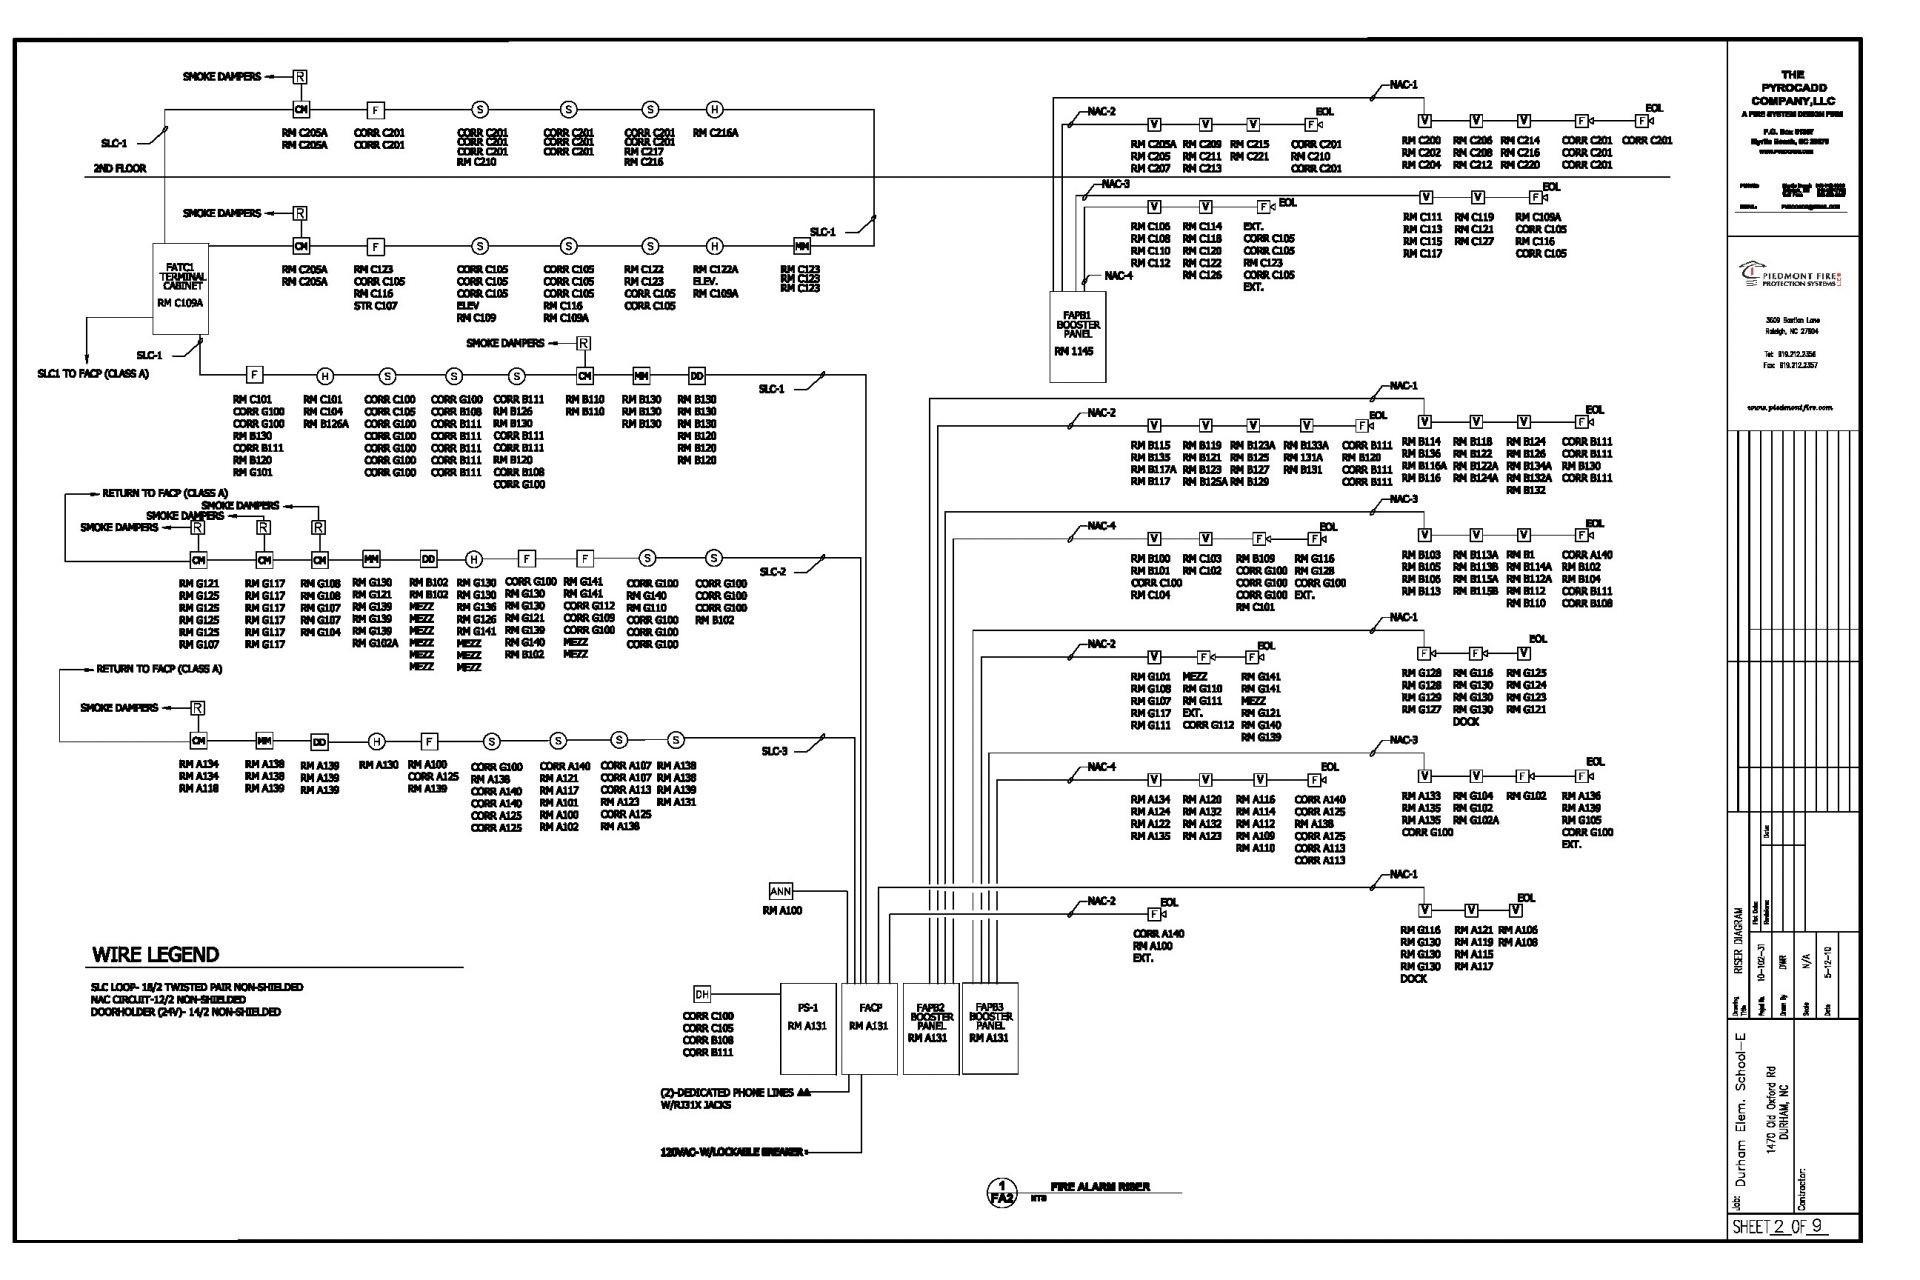 Wiring Diagram Addressable Fire Alarm Refrence Smoke Detector Wiring Diagram Pdf Fresh Addressable Fire Alarm